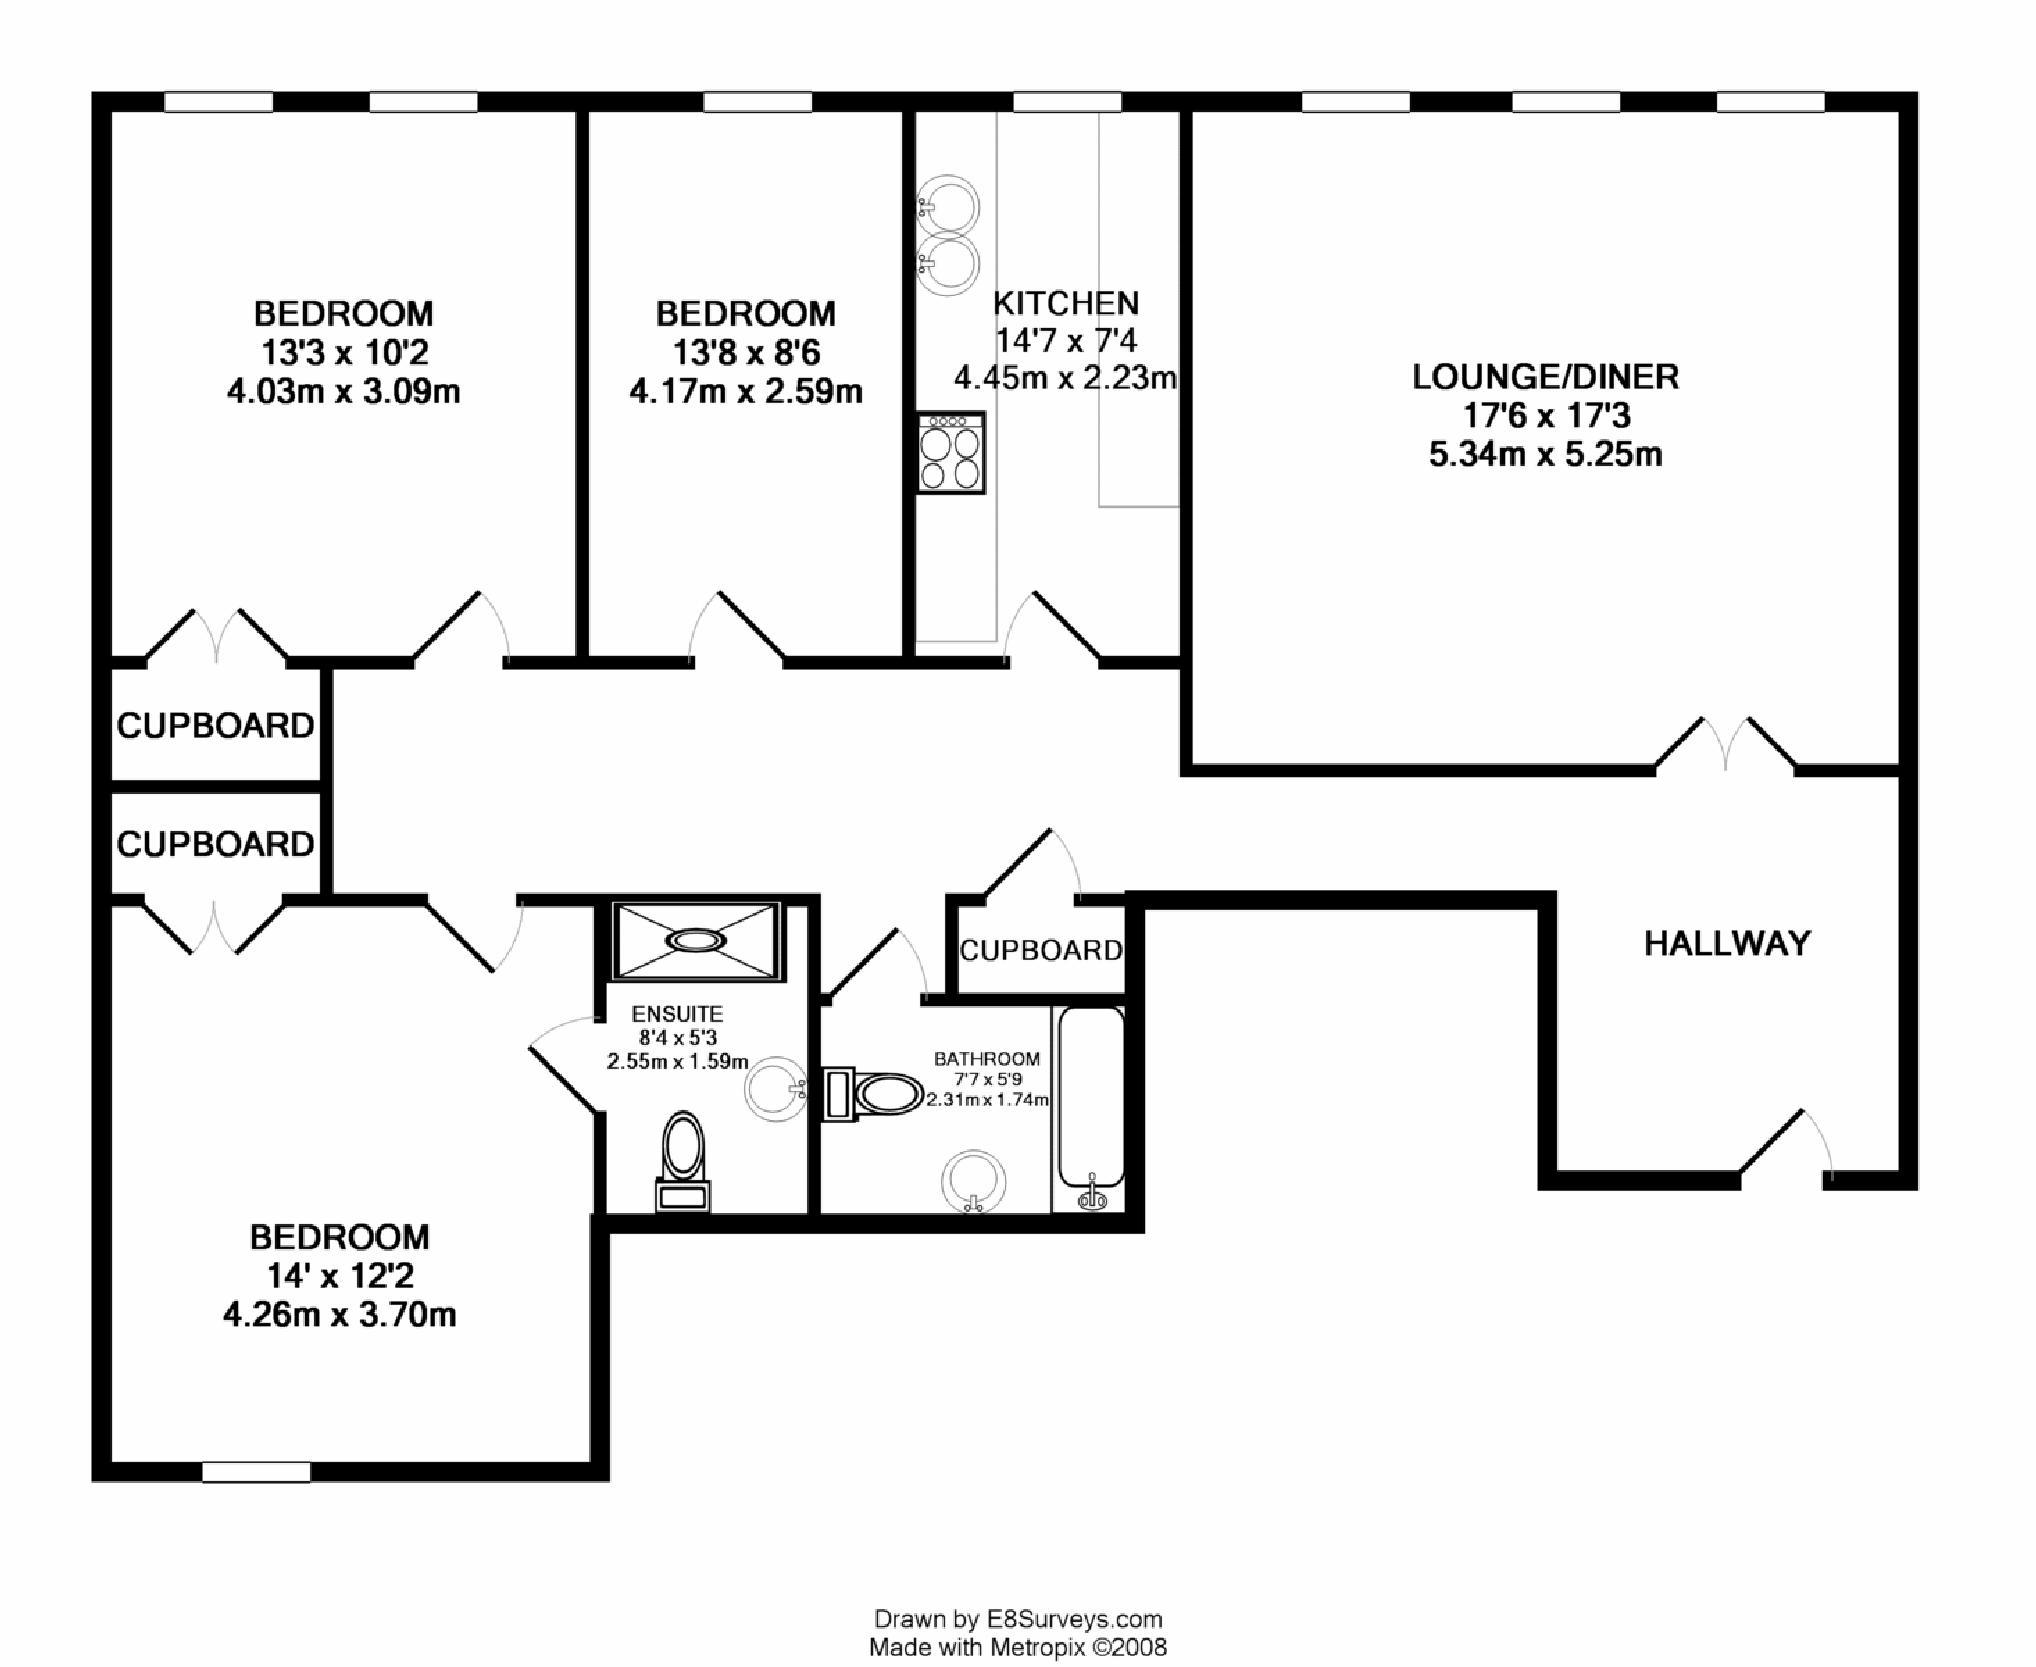 Drawn bedroom inside house #3